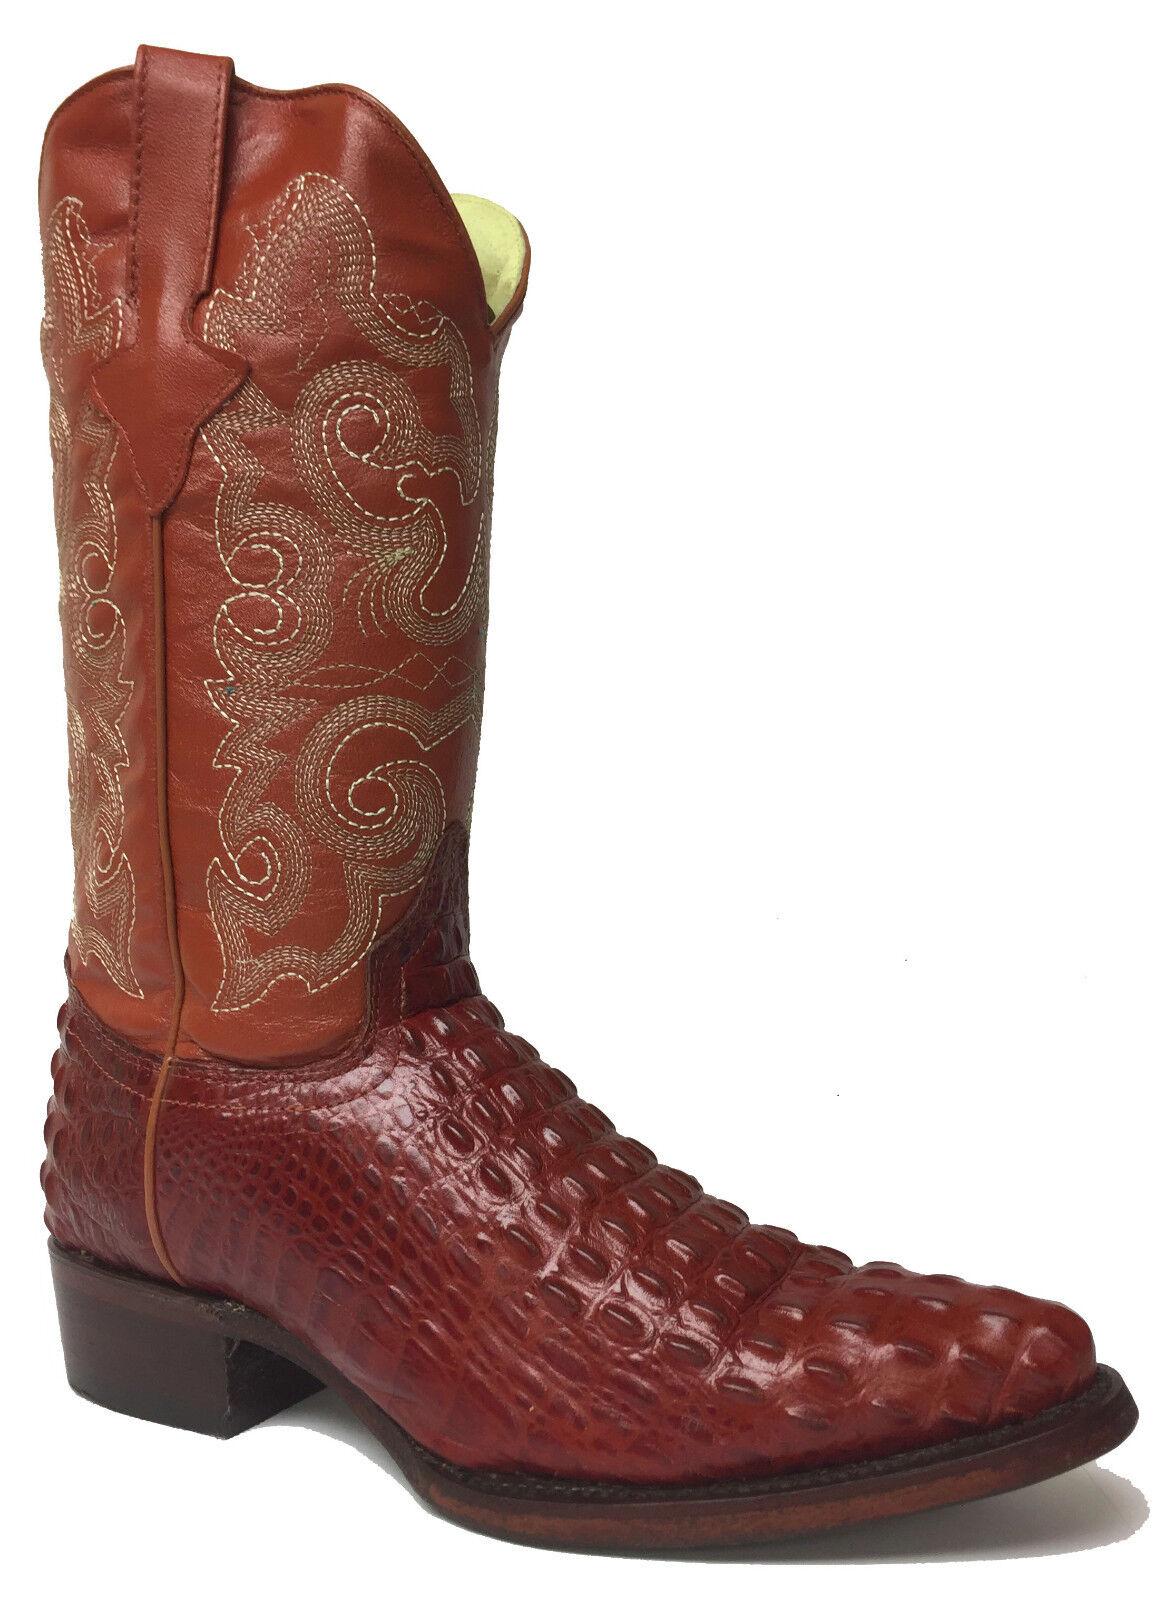 New Uomo Cognac Brown Crocodile Alligator Pelle Western Cowboy Stivali J Toe